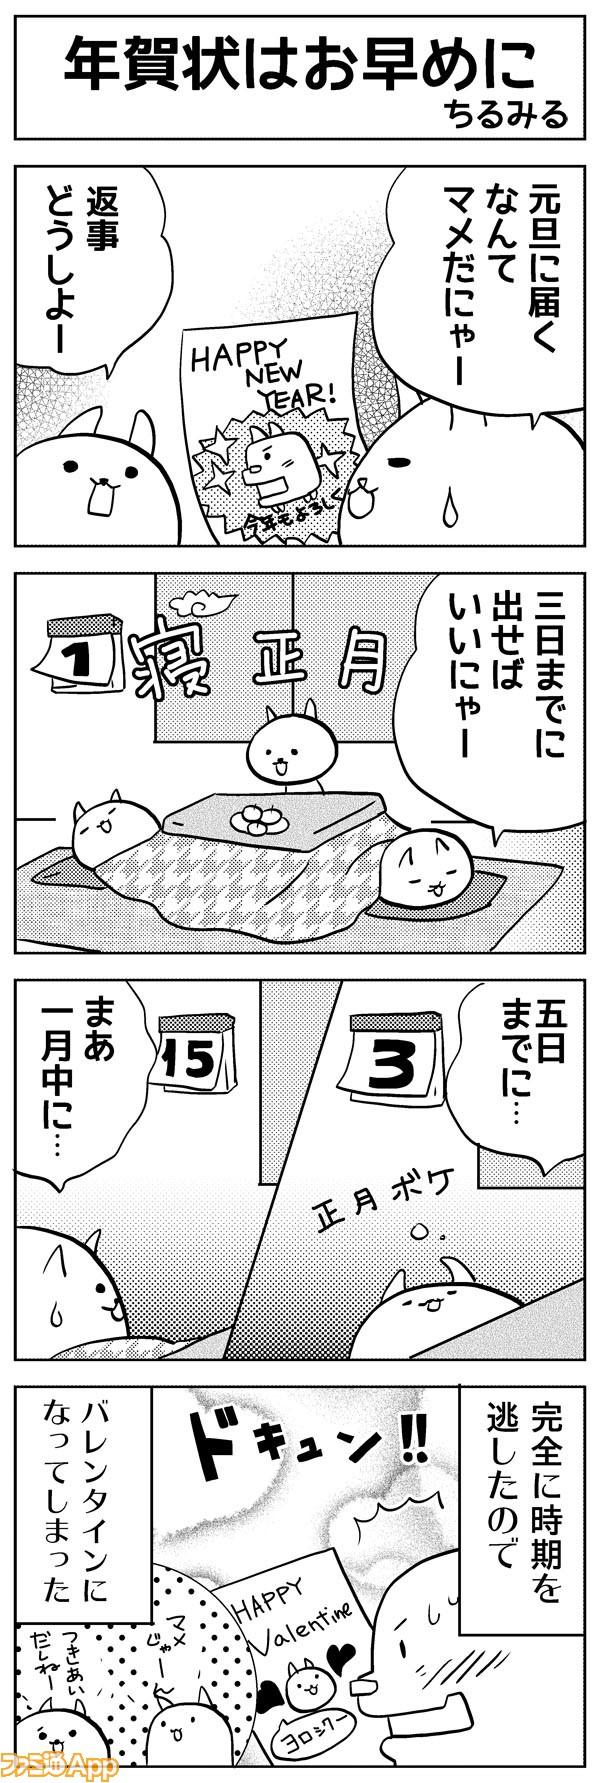 12chiru_004